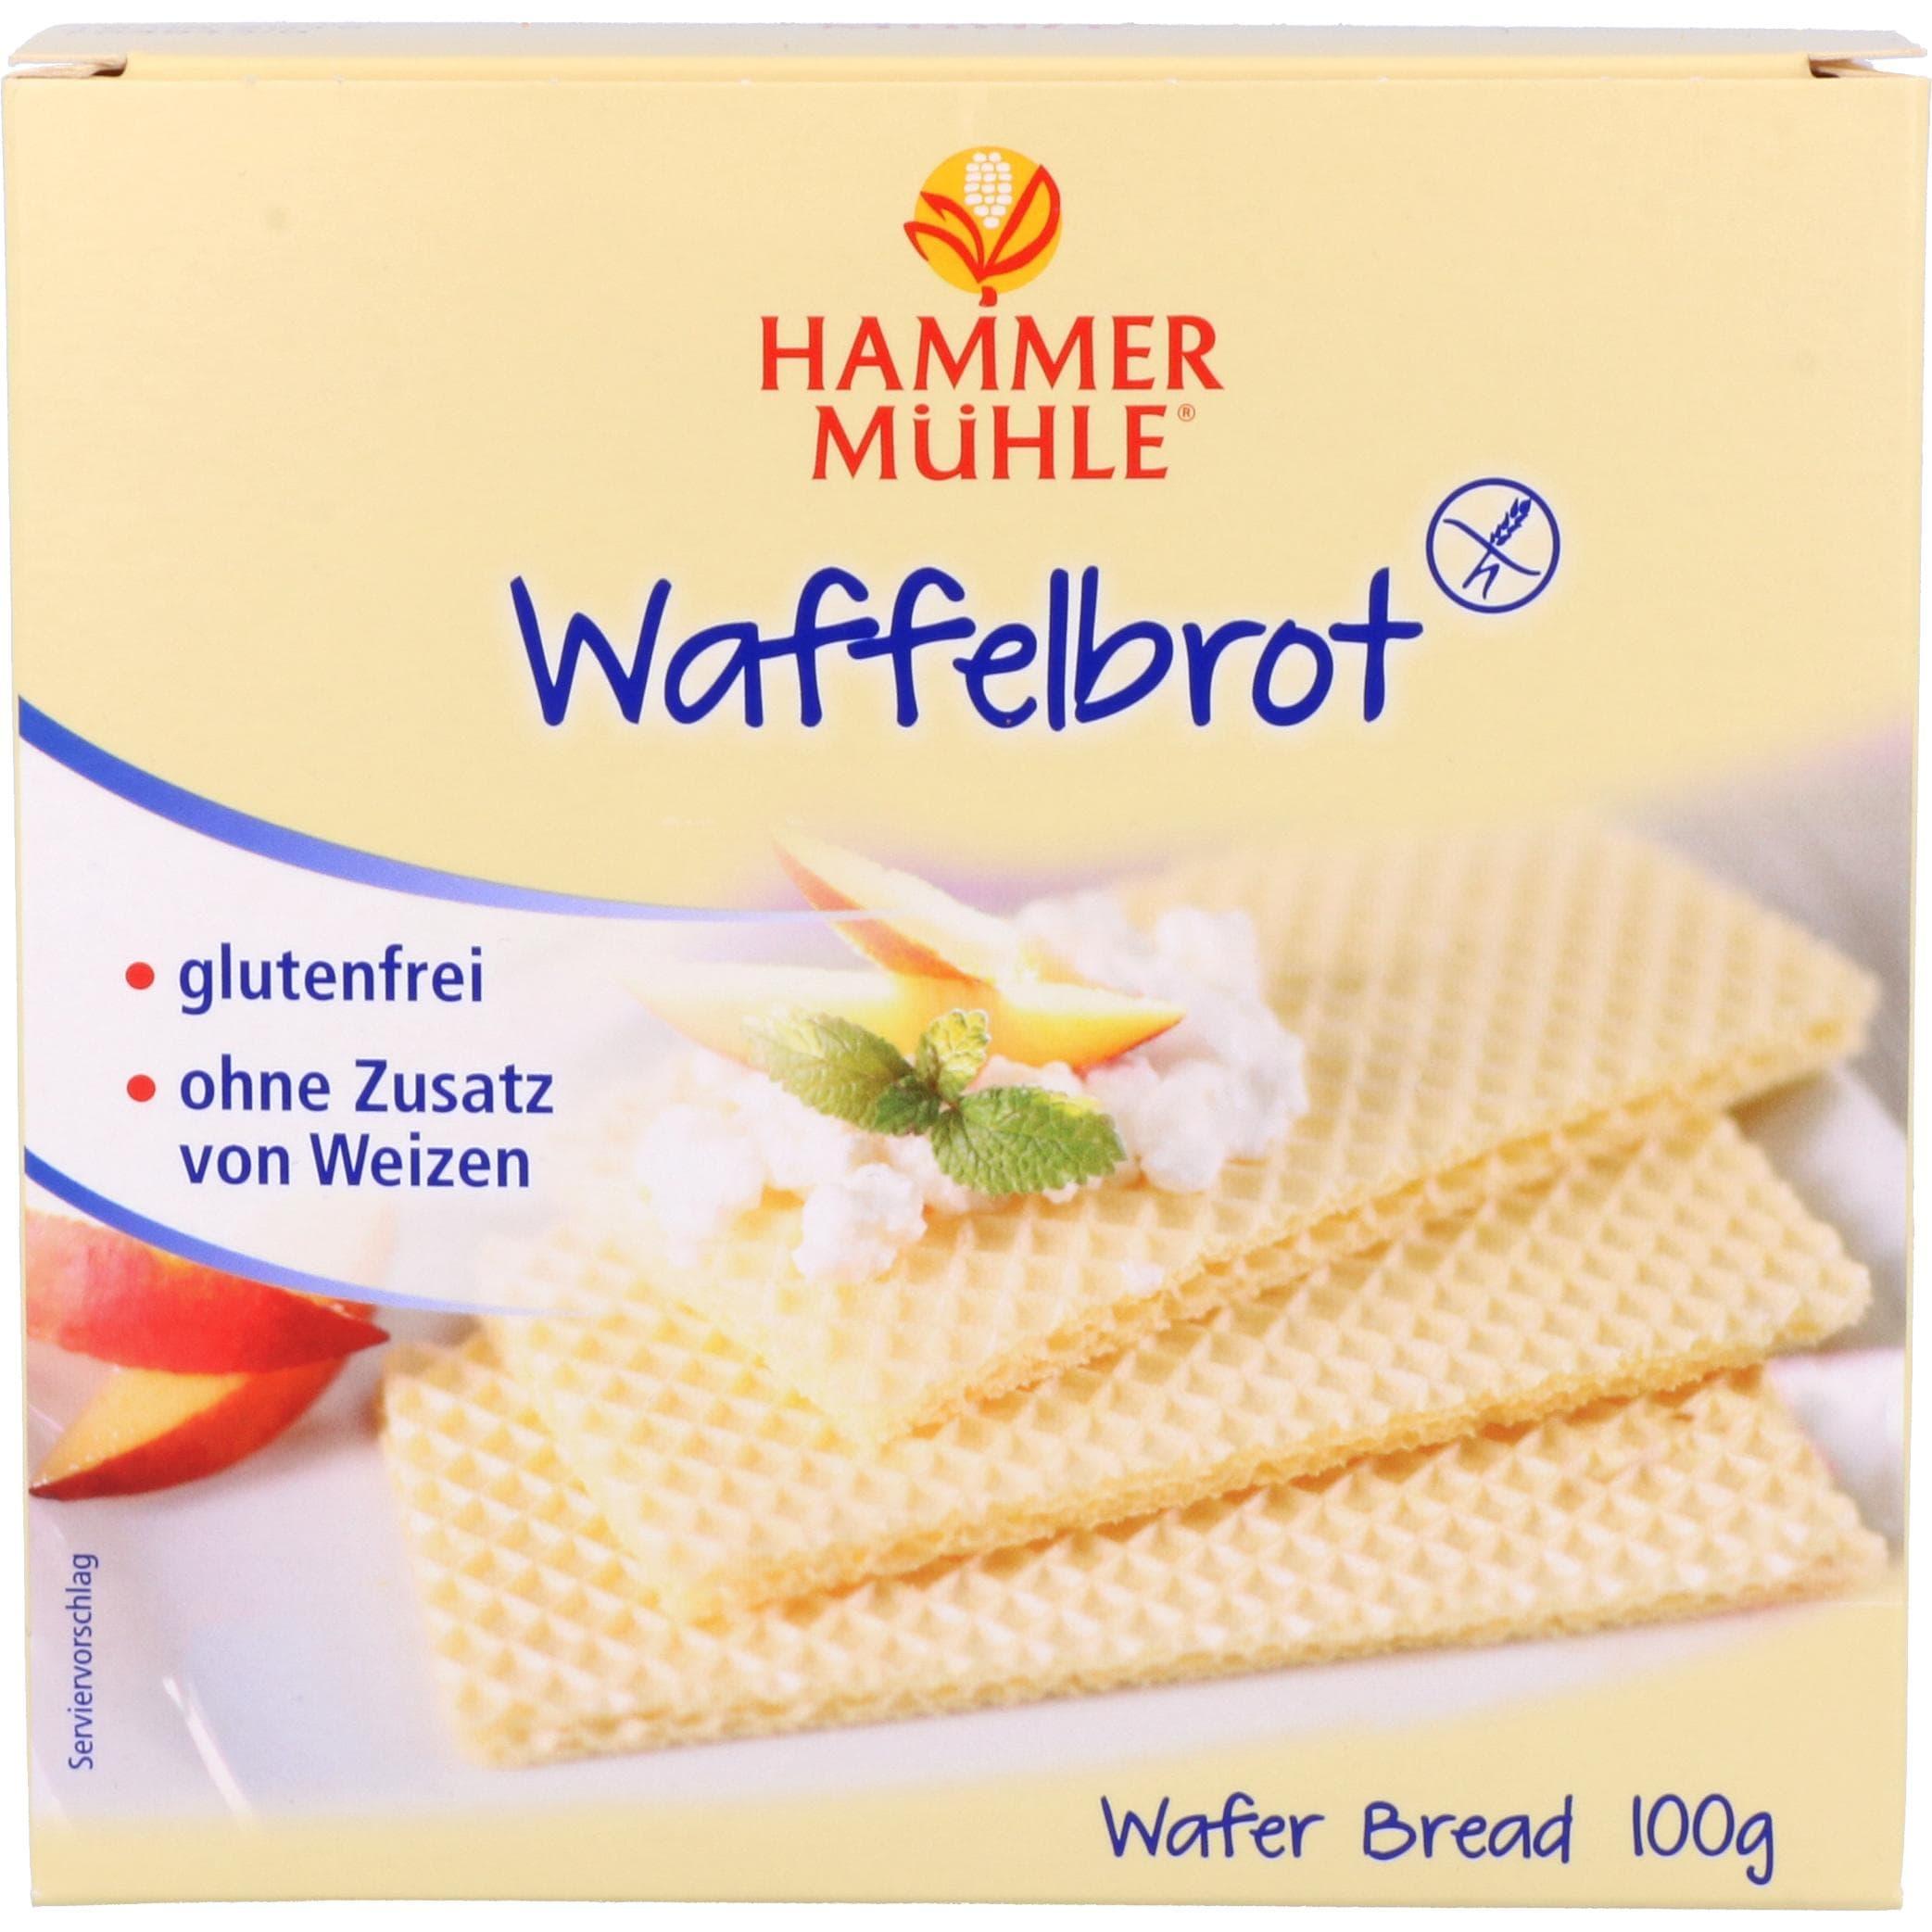 Hammermühle Waffelbrot 100g